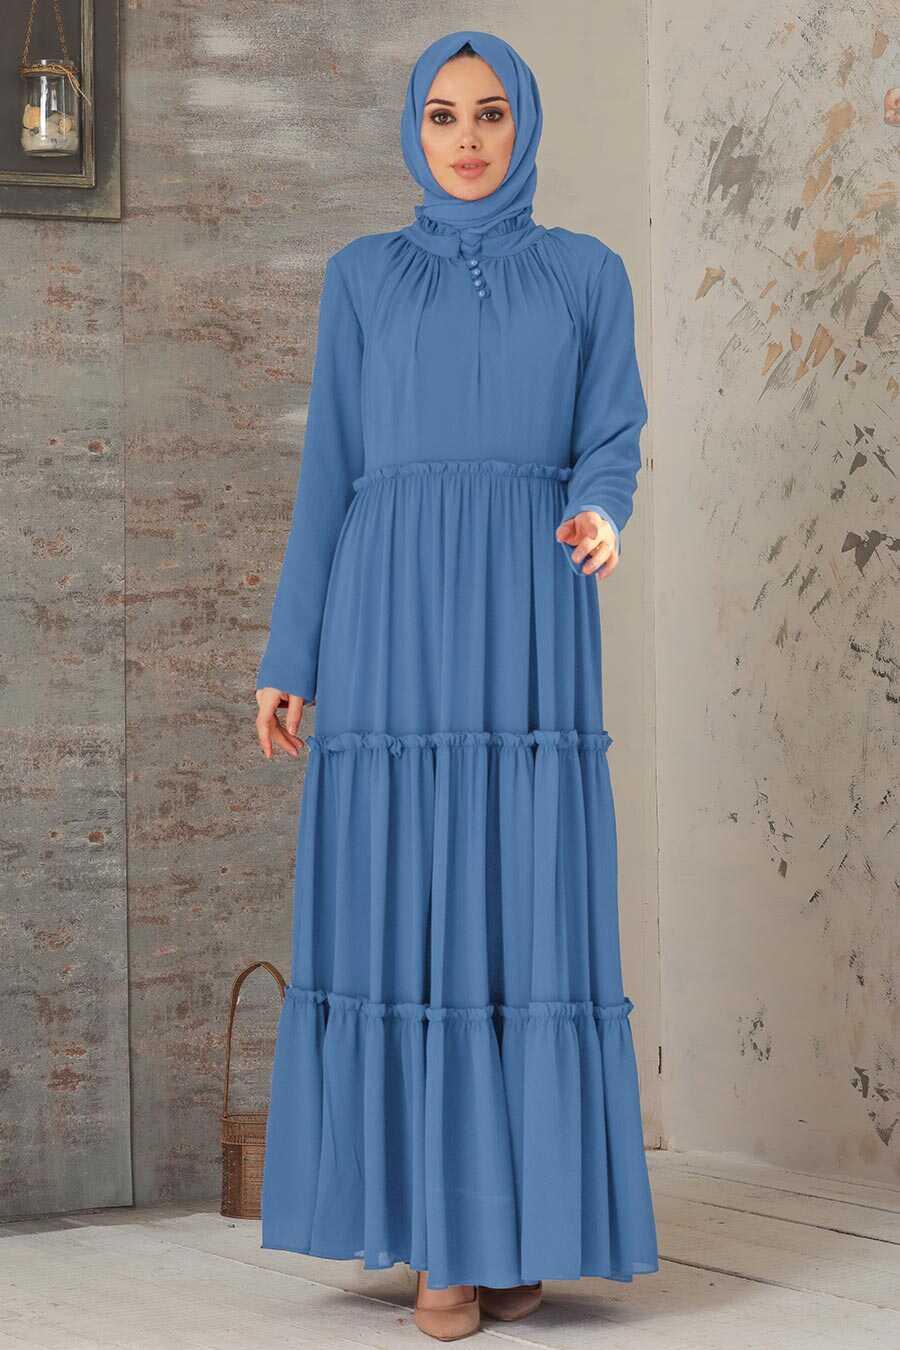 İndigo Blue Hijab Dress 2746IM